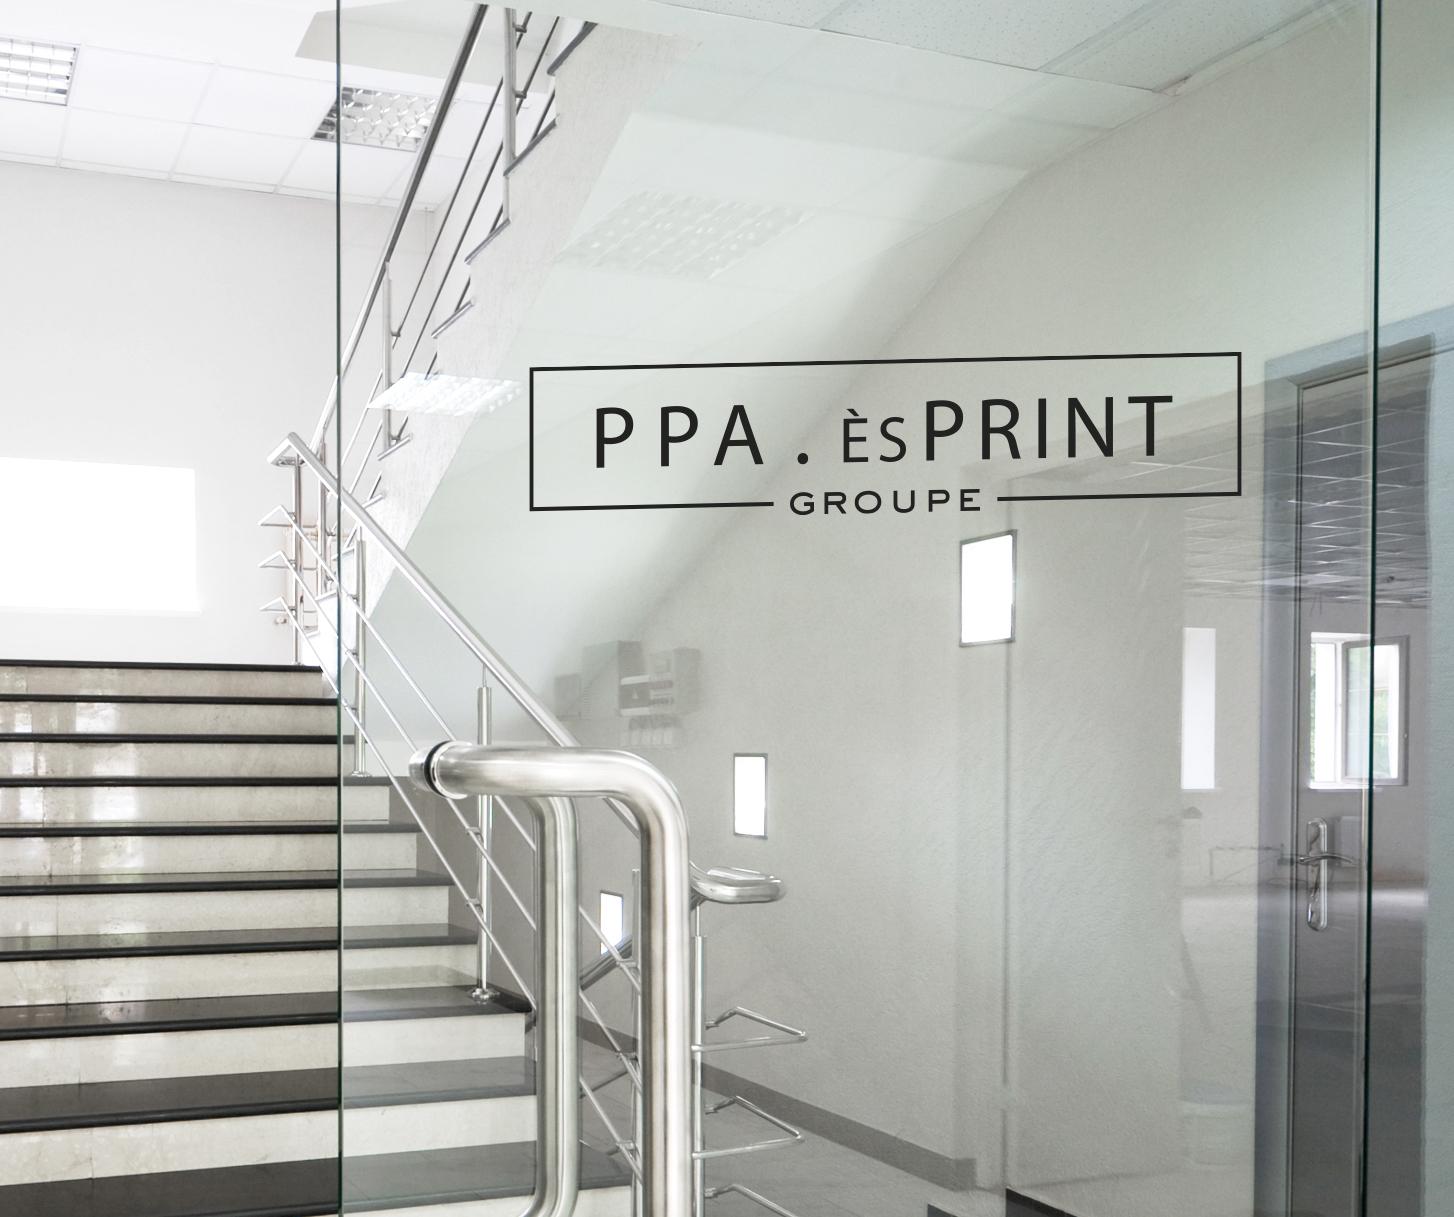 Groupe PPA esPrint